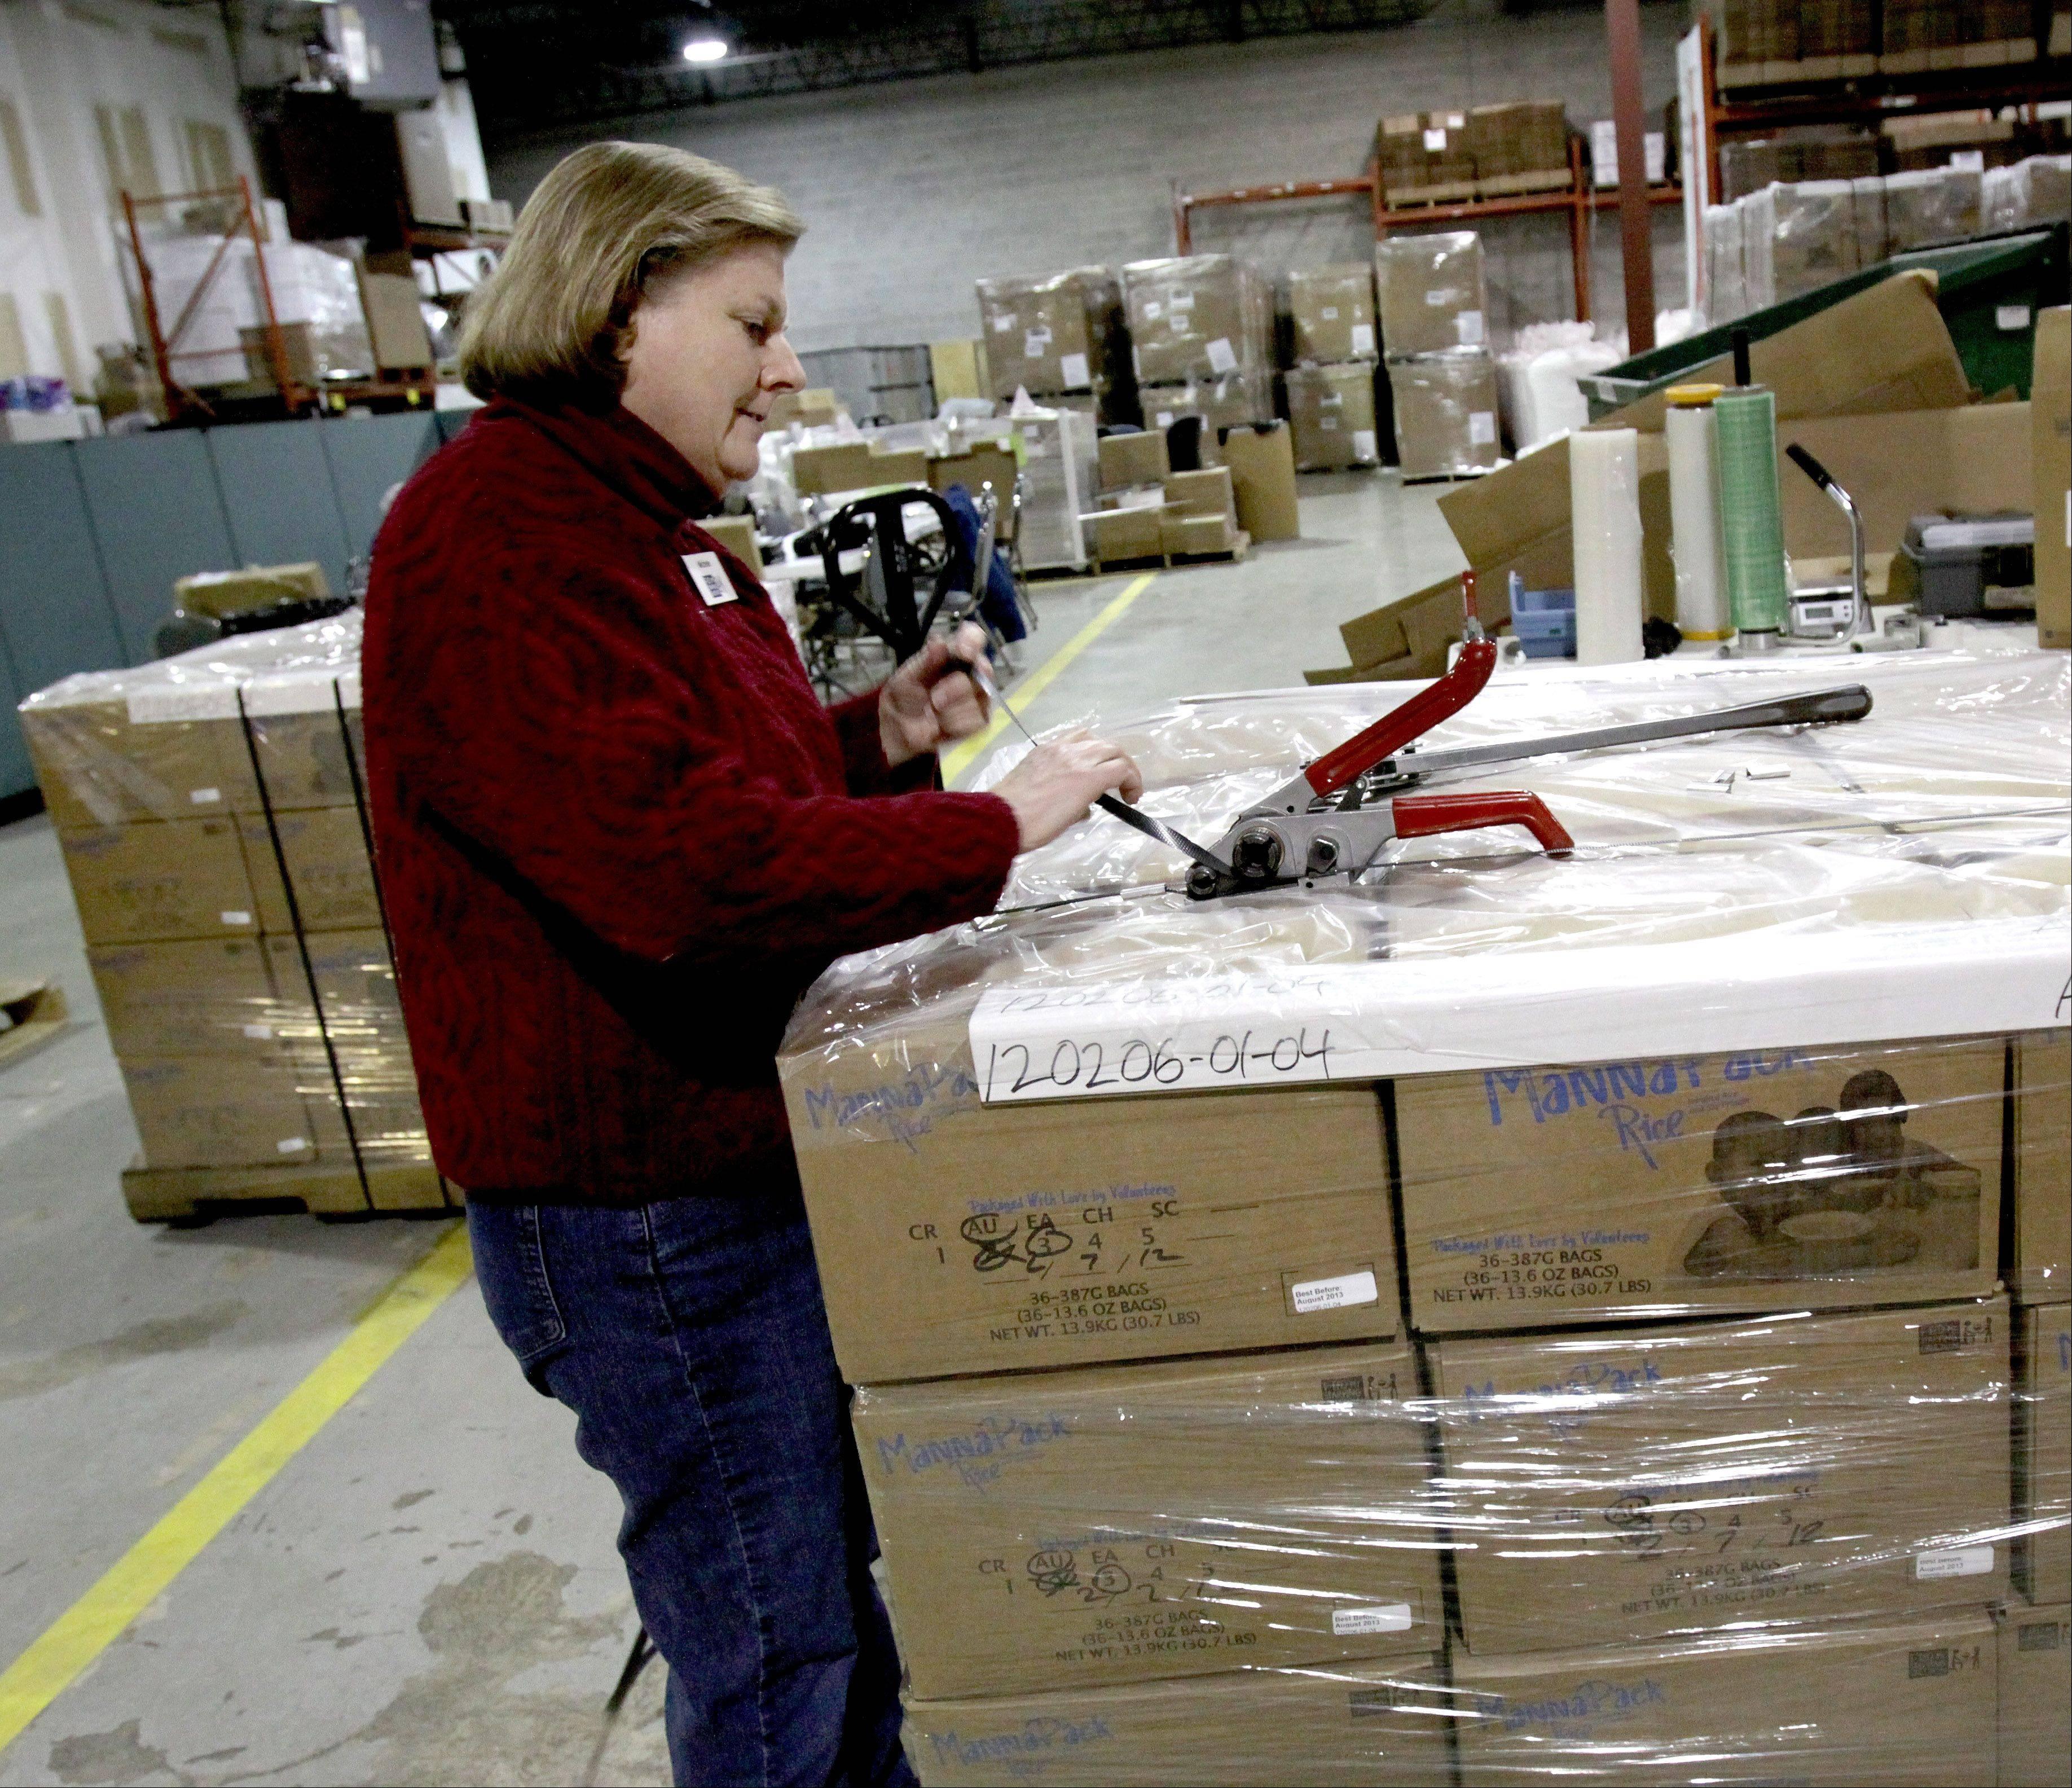 warehouse receiving job description Template – Warehouse Receiving Job Description